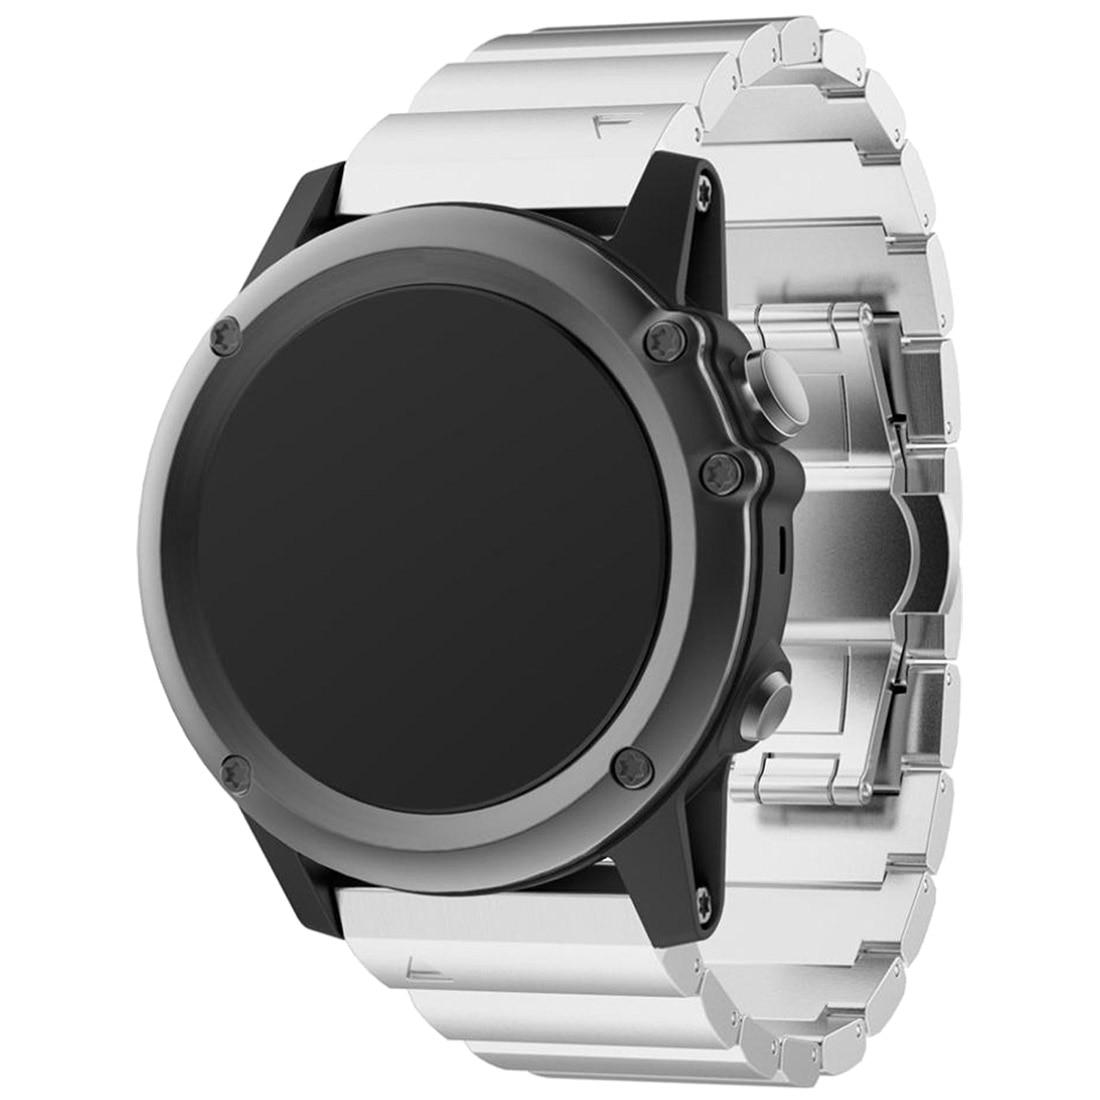 Metal Bracelet Stainless Steel Watch Wrist Band Strap For Garmin